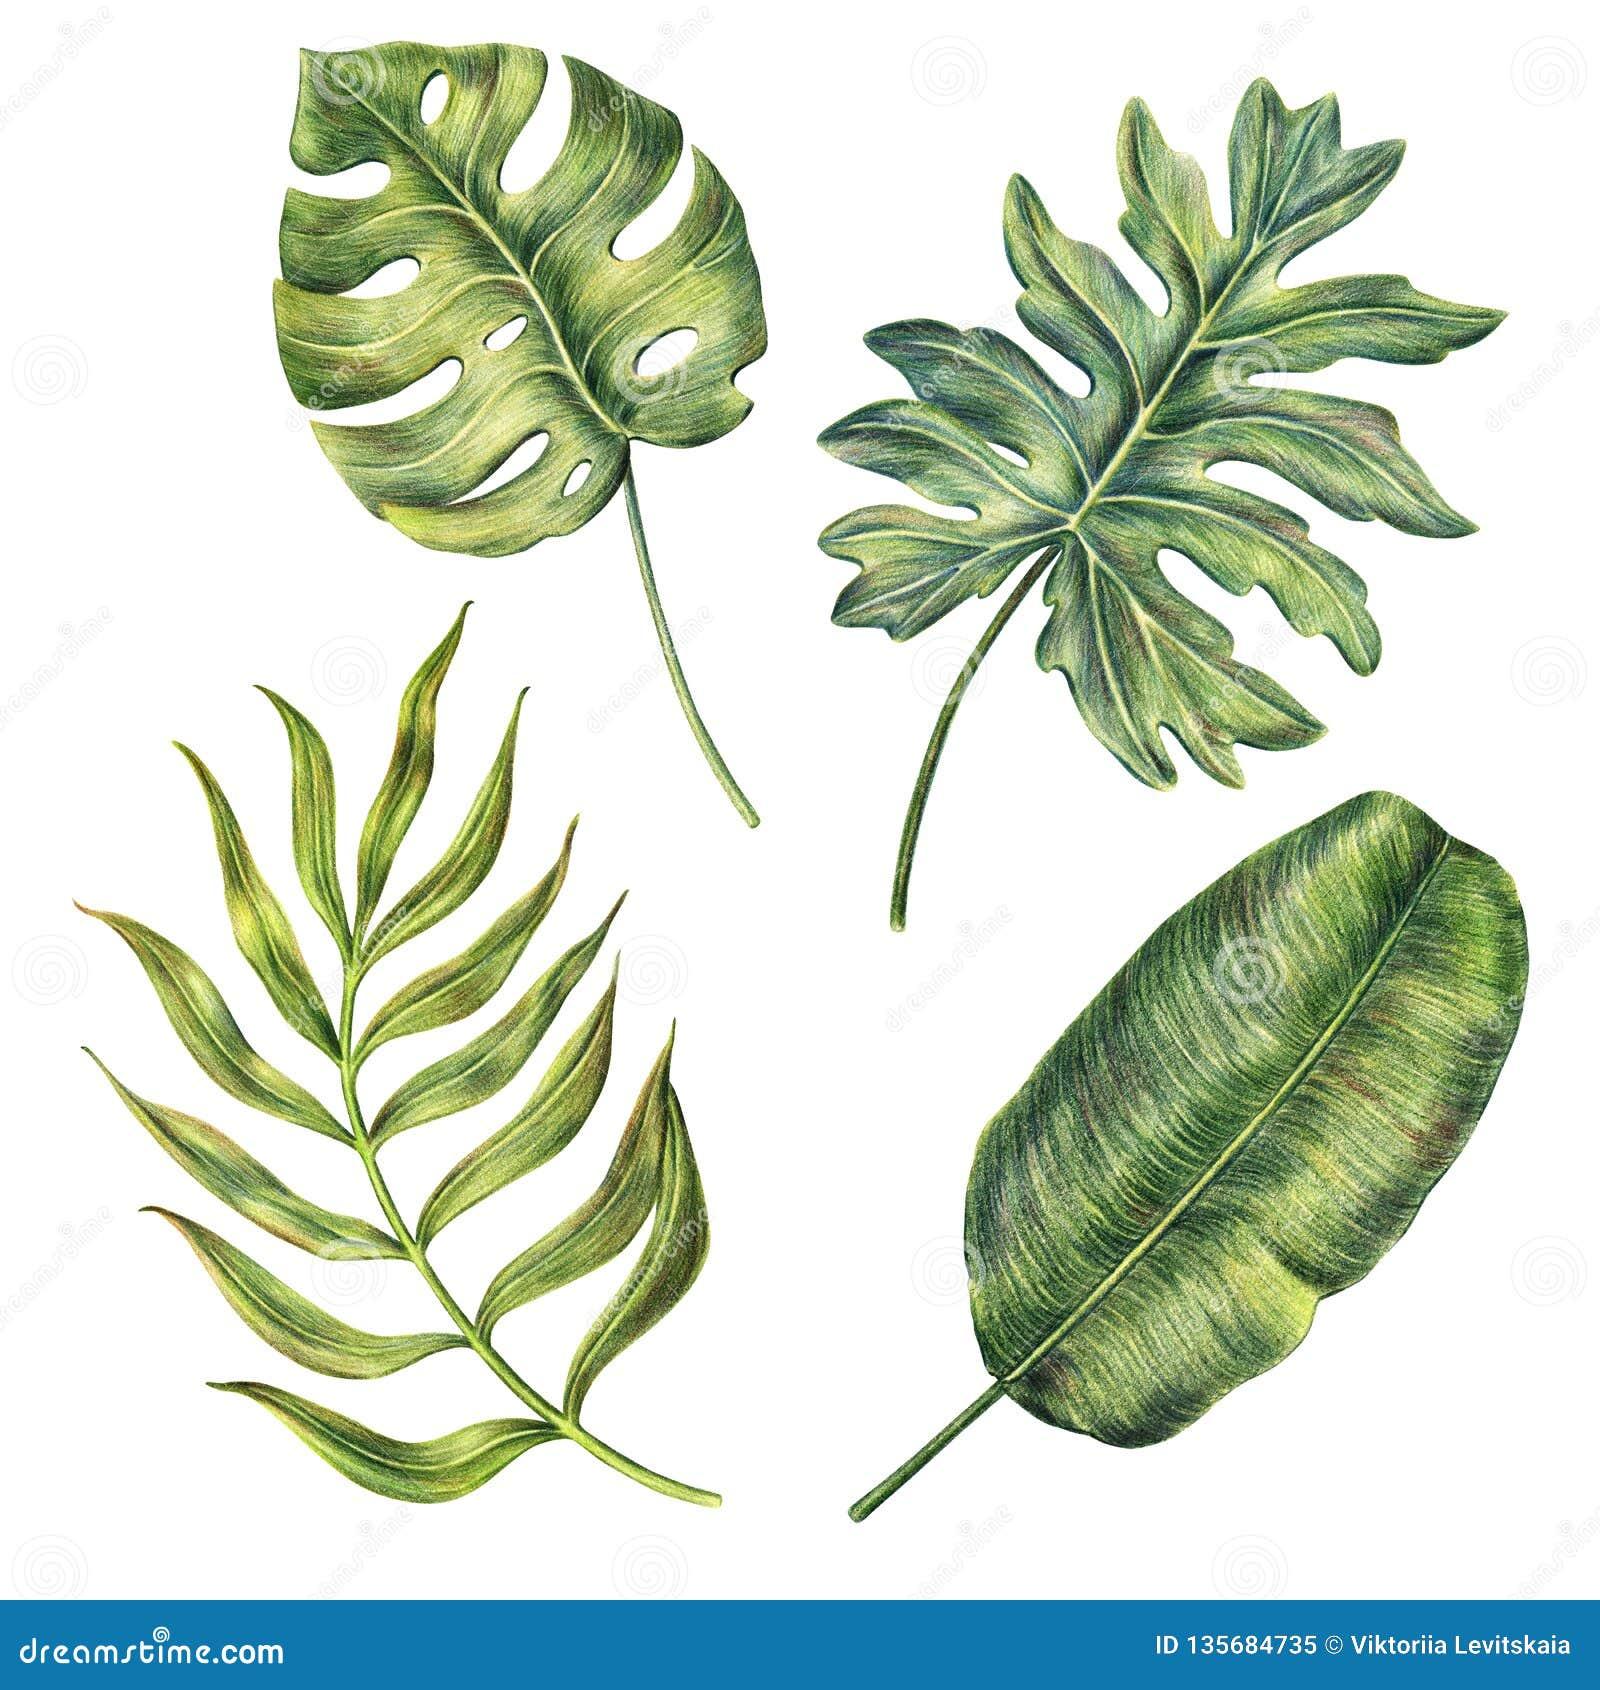 Hand drawn monstera, banana and areca palm leaves